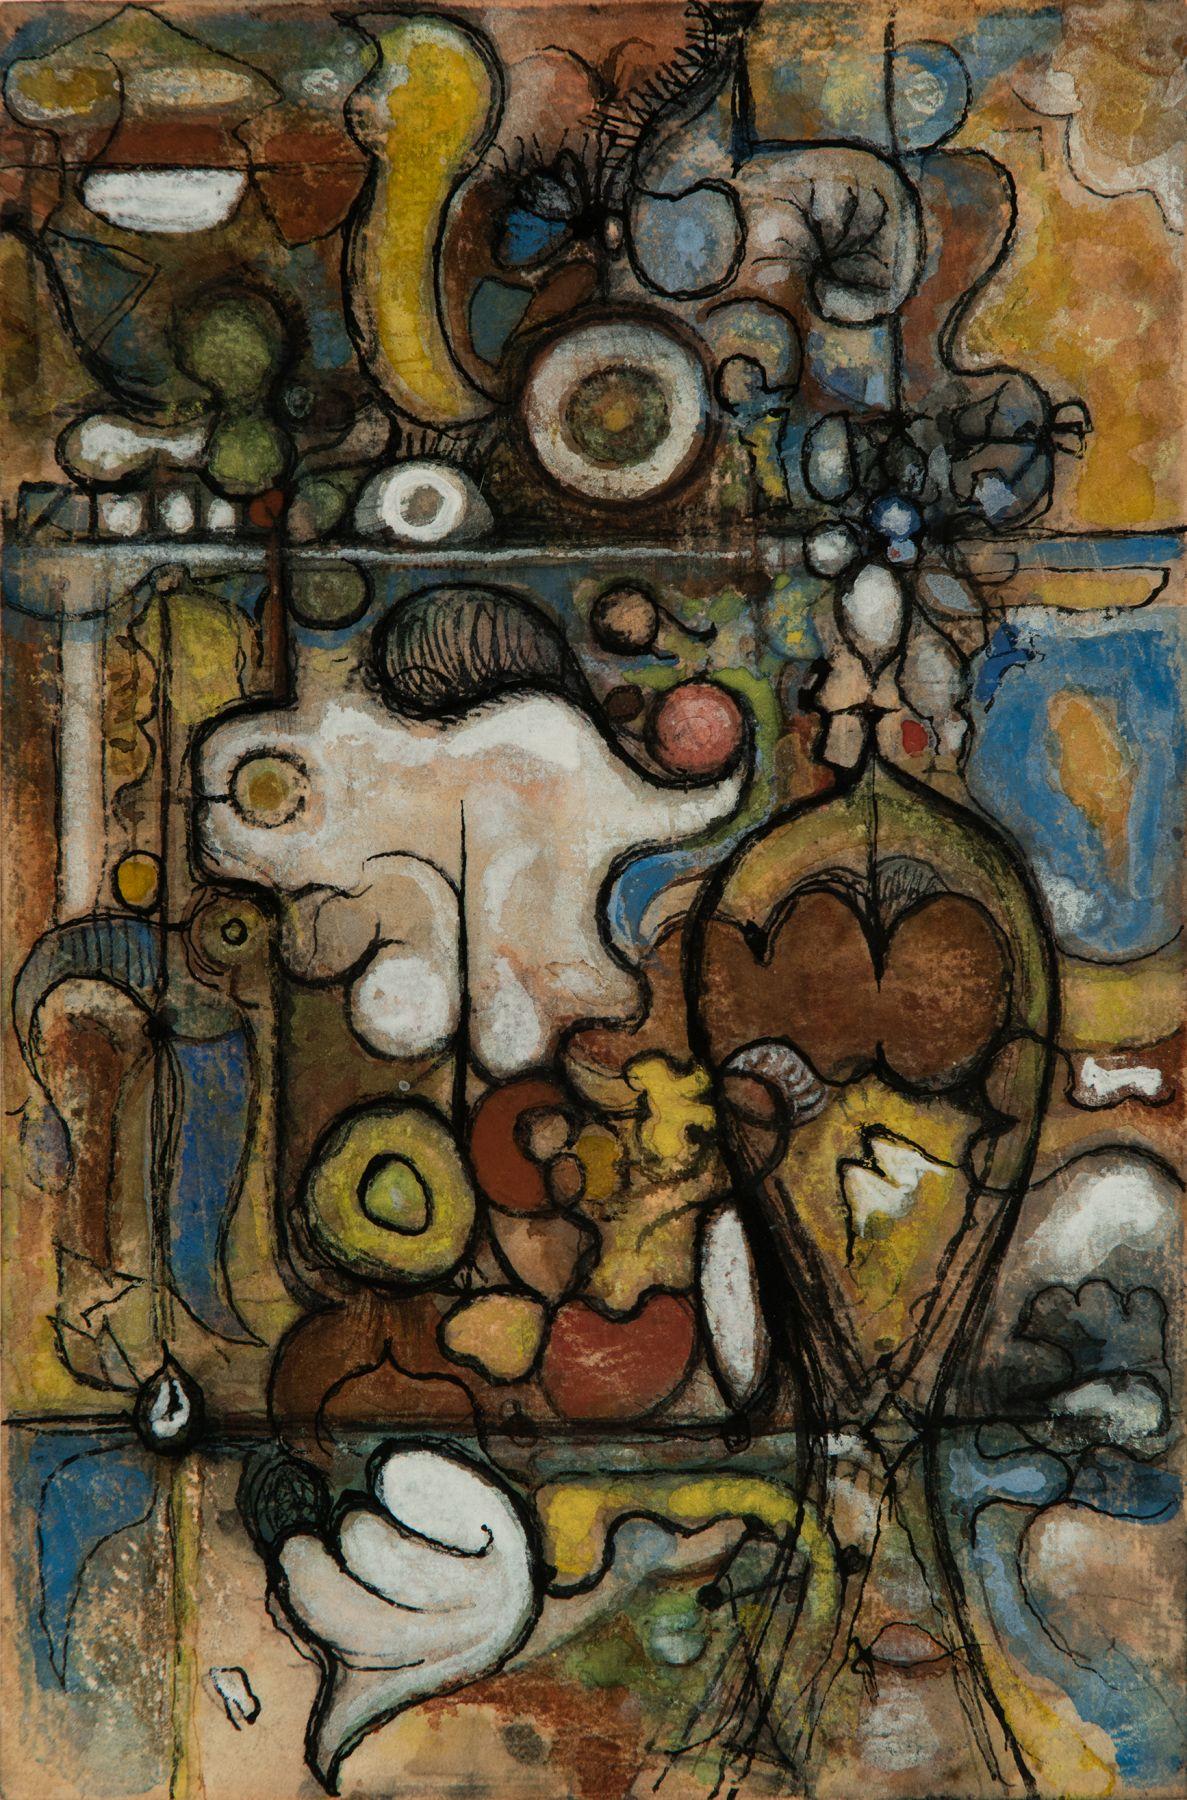 Richard Pousette-Dart (1916-1992) Untitled, circa 1945